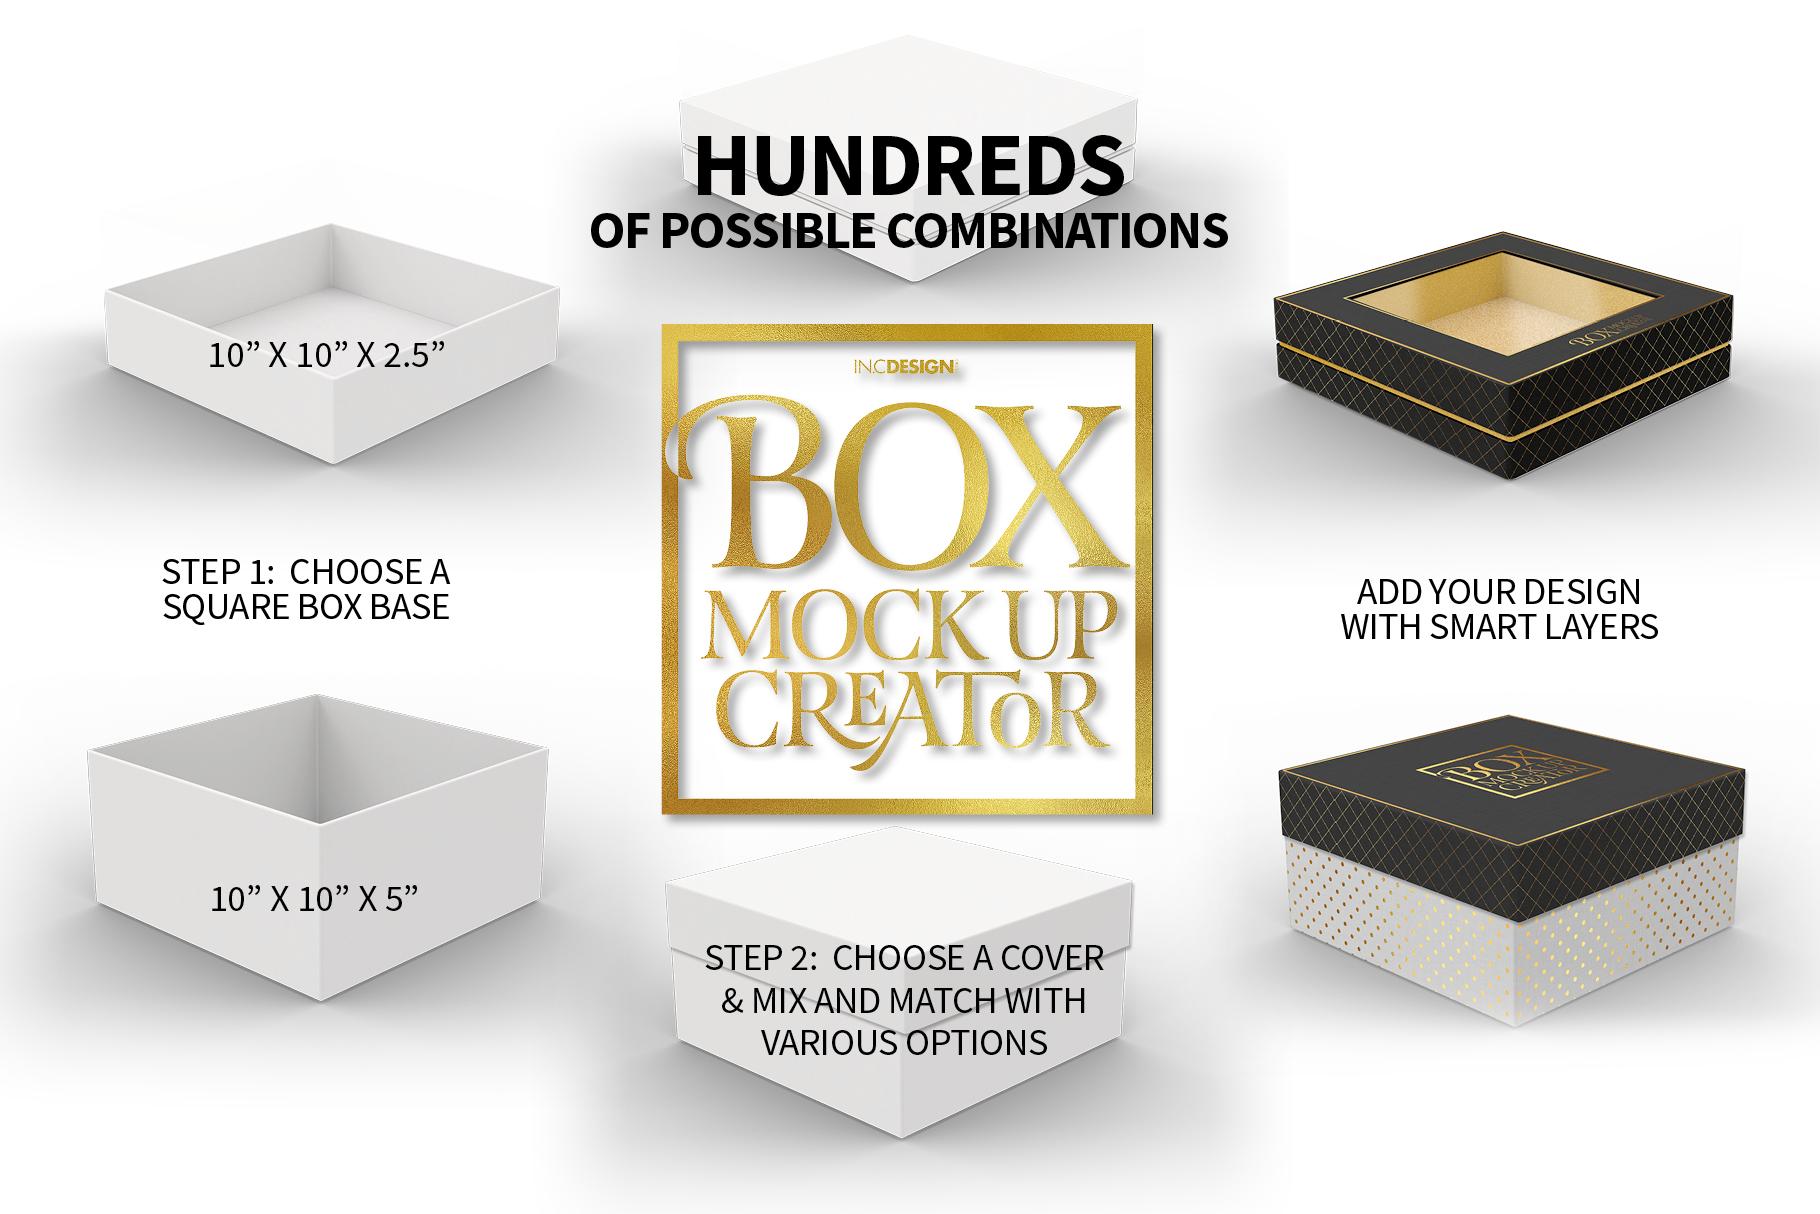 Square Box Packaging Mockup Creator example image 2